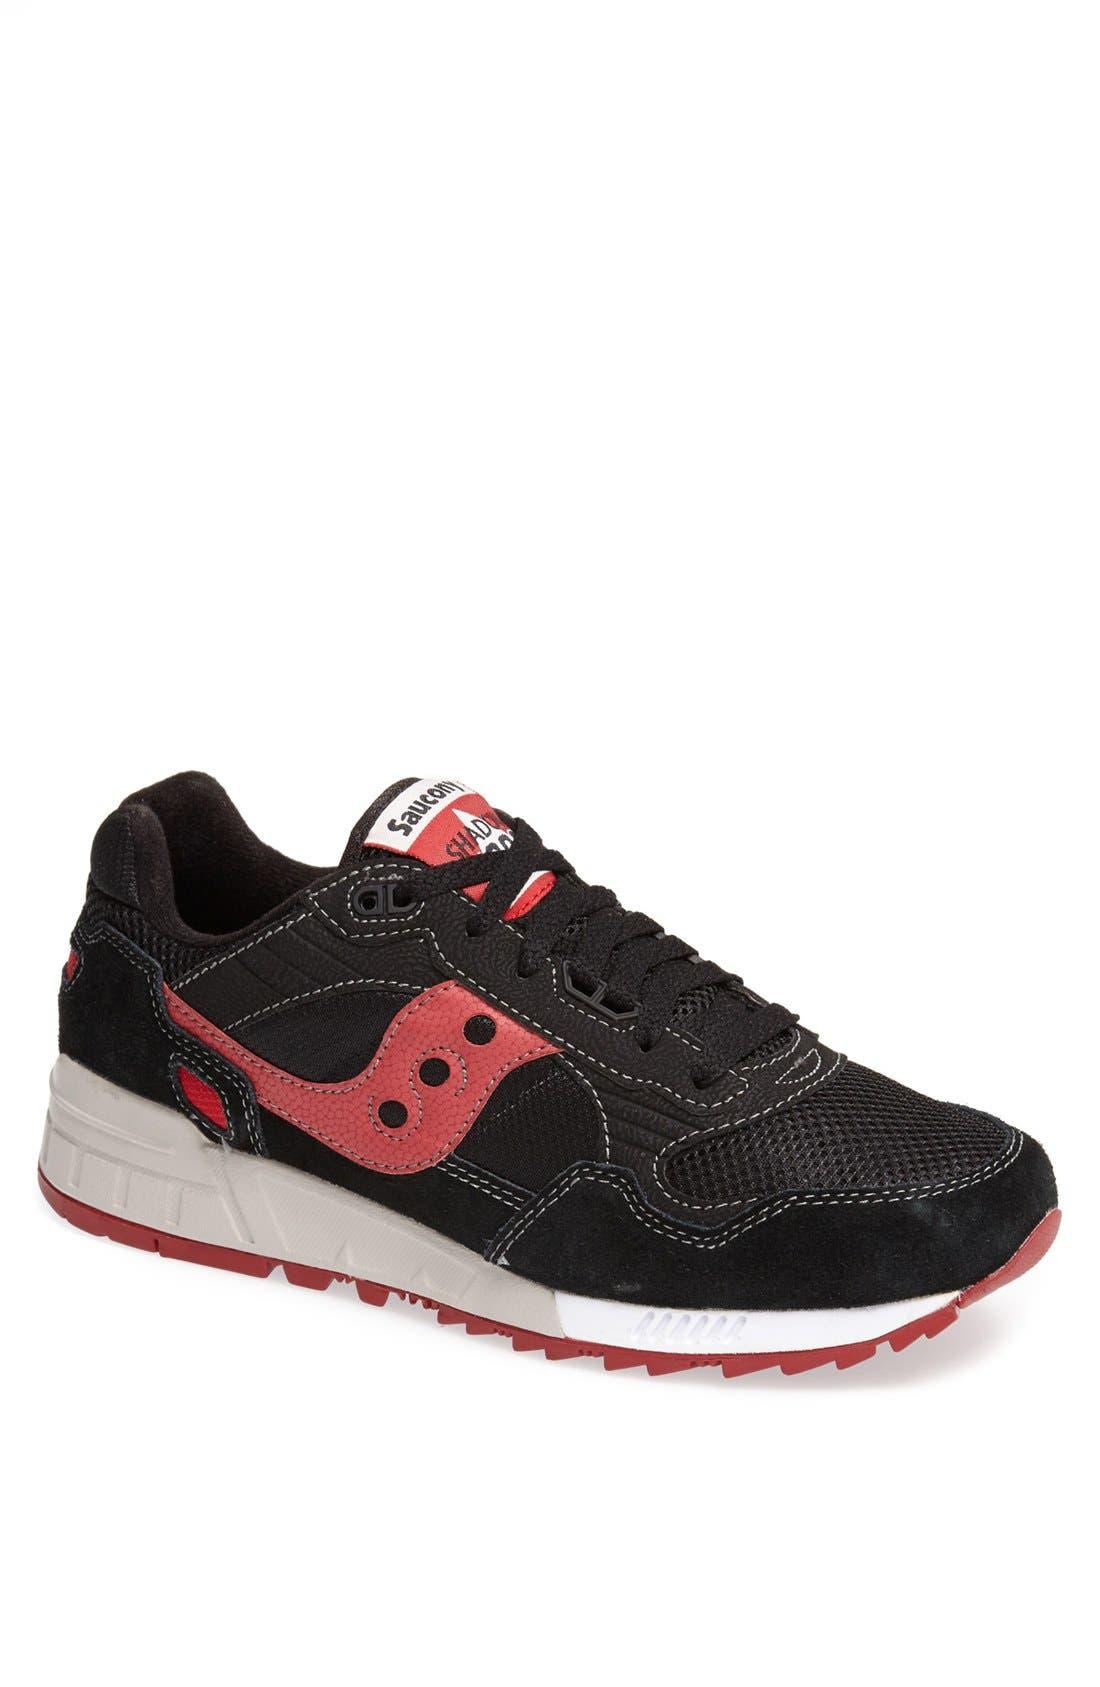 Alternate Image 1 Selected - Saucony 'Shadow 5000' Sneaker (Men)